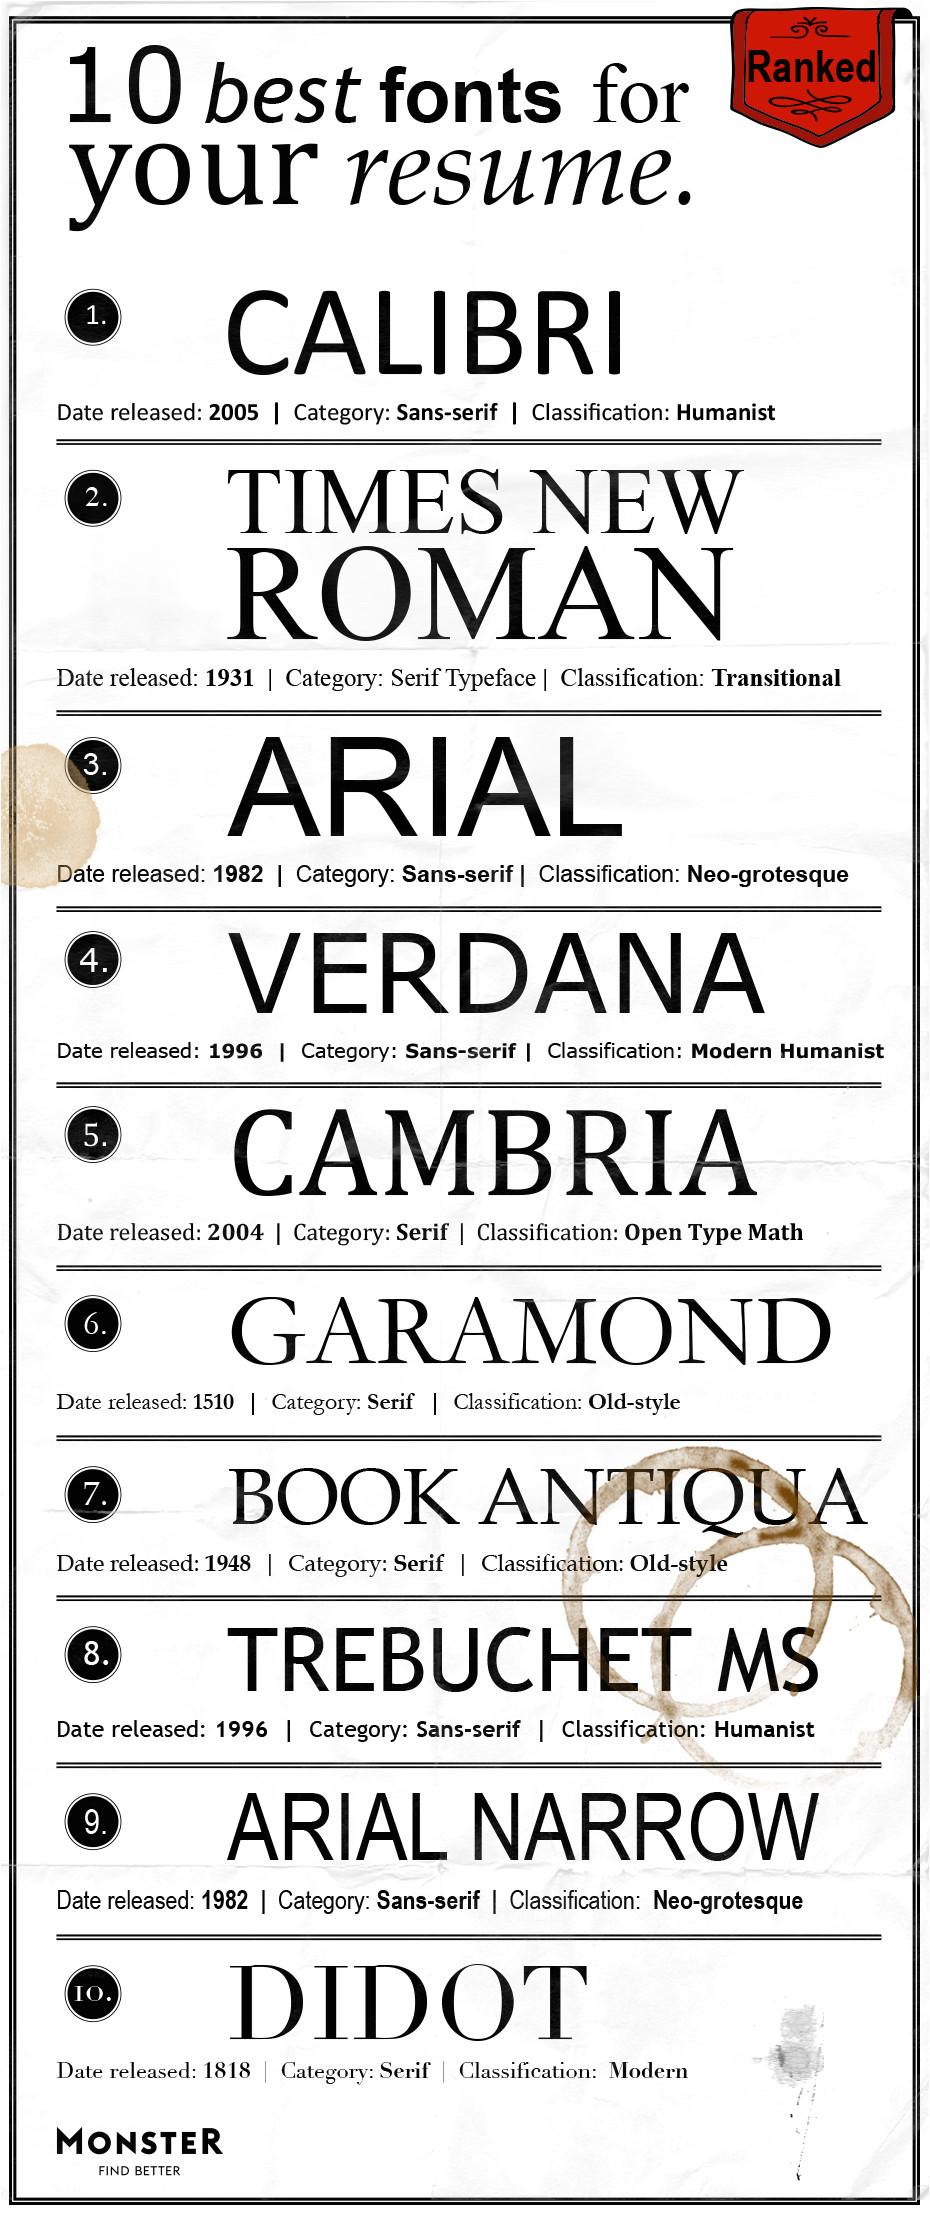 A Professional Resume Font Best Fonts for Your Resume Monster Com